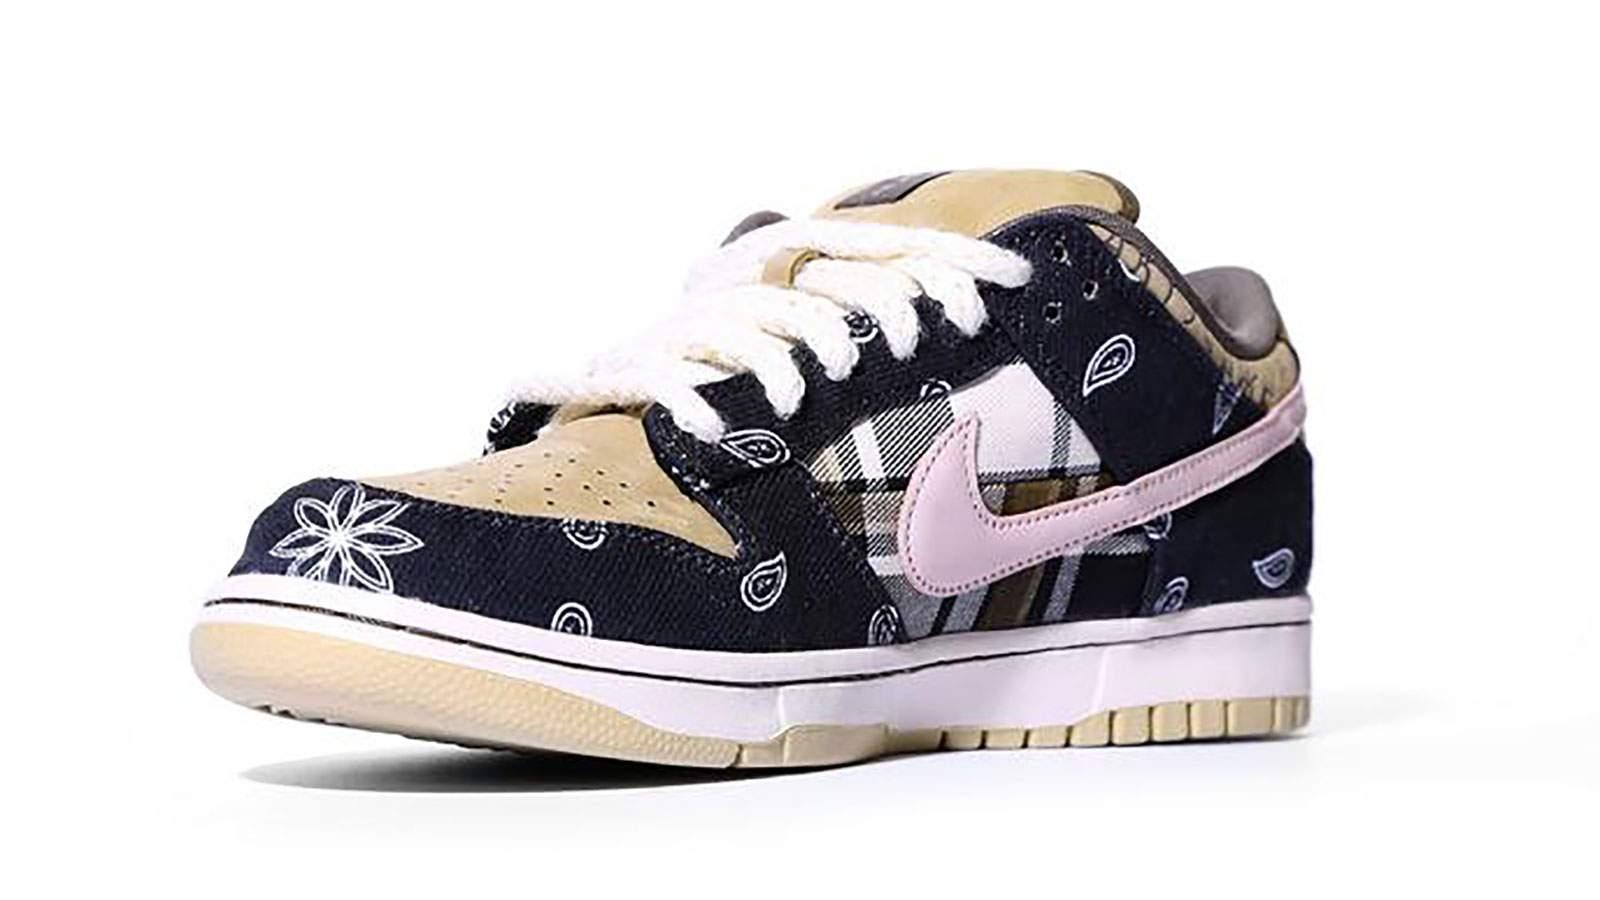 Newly released Nike sneakers designed by Travis Scott ...